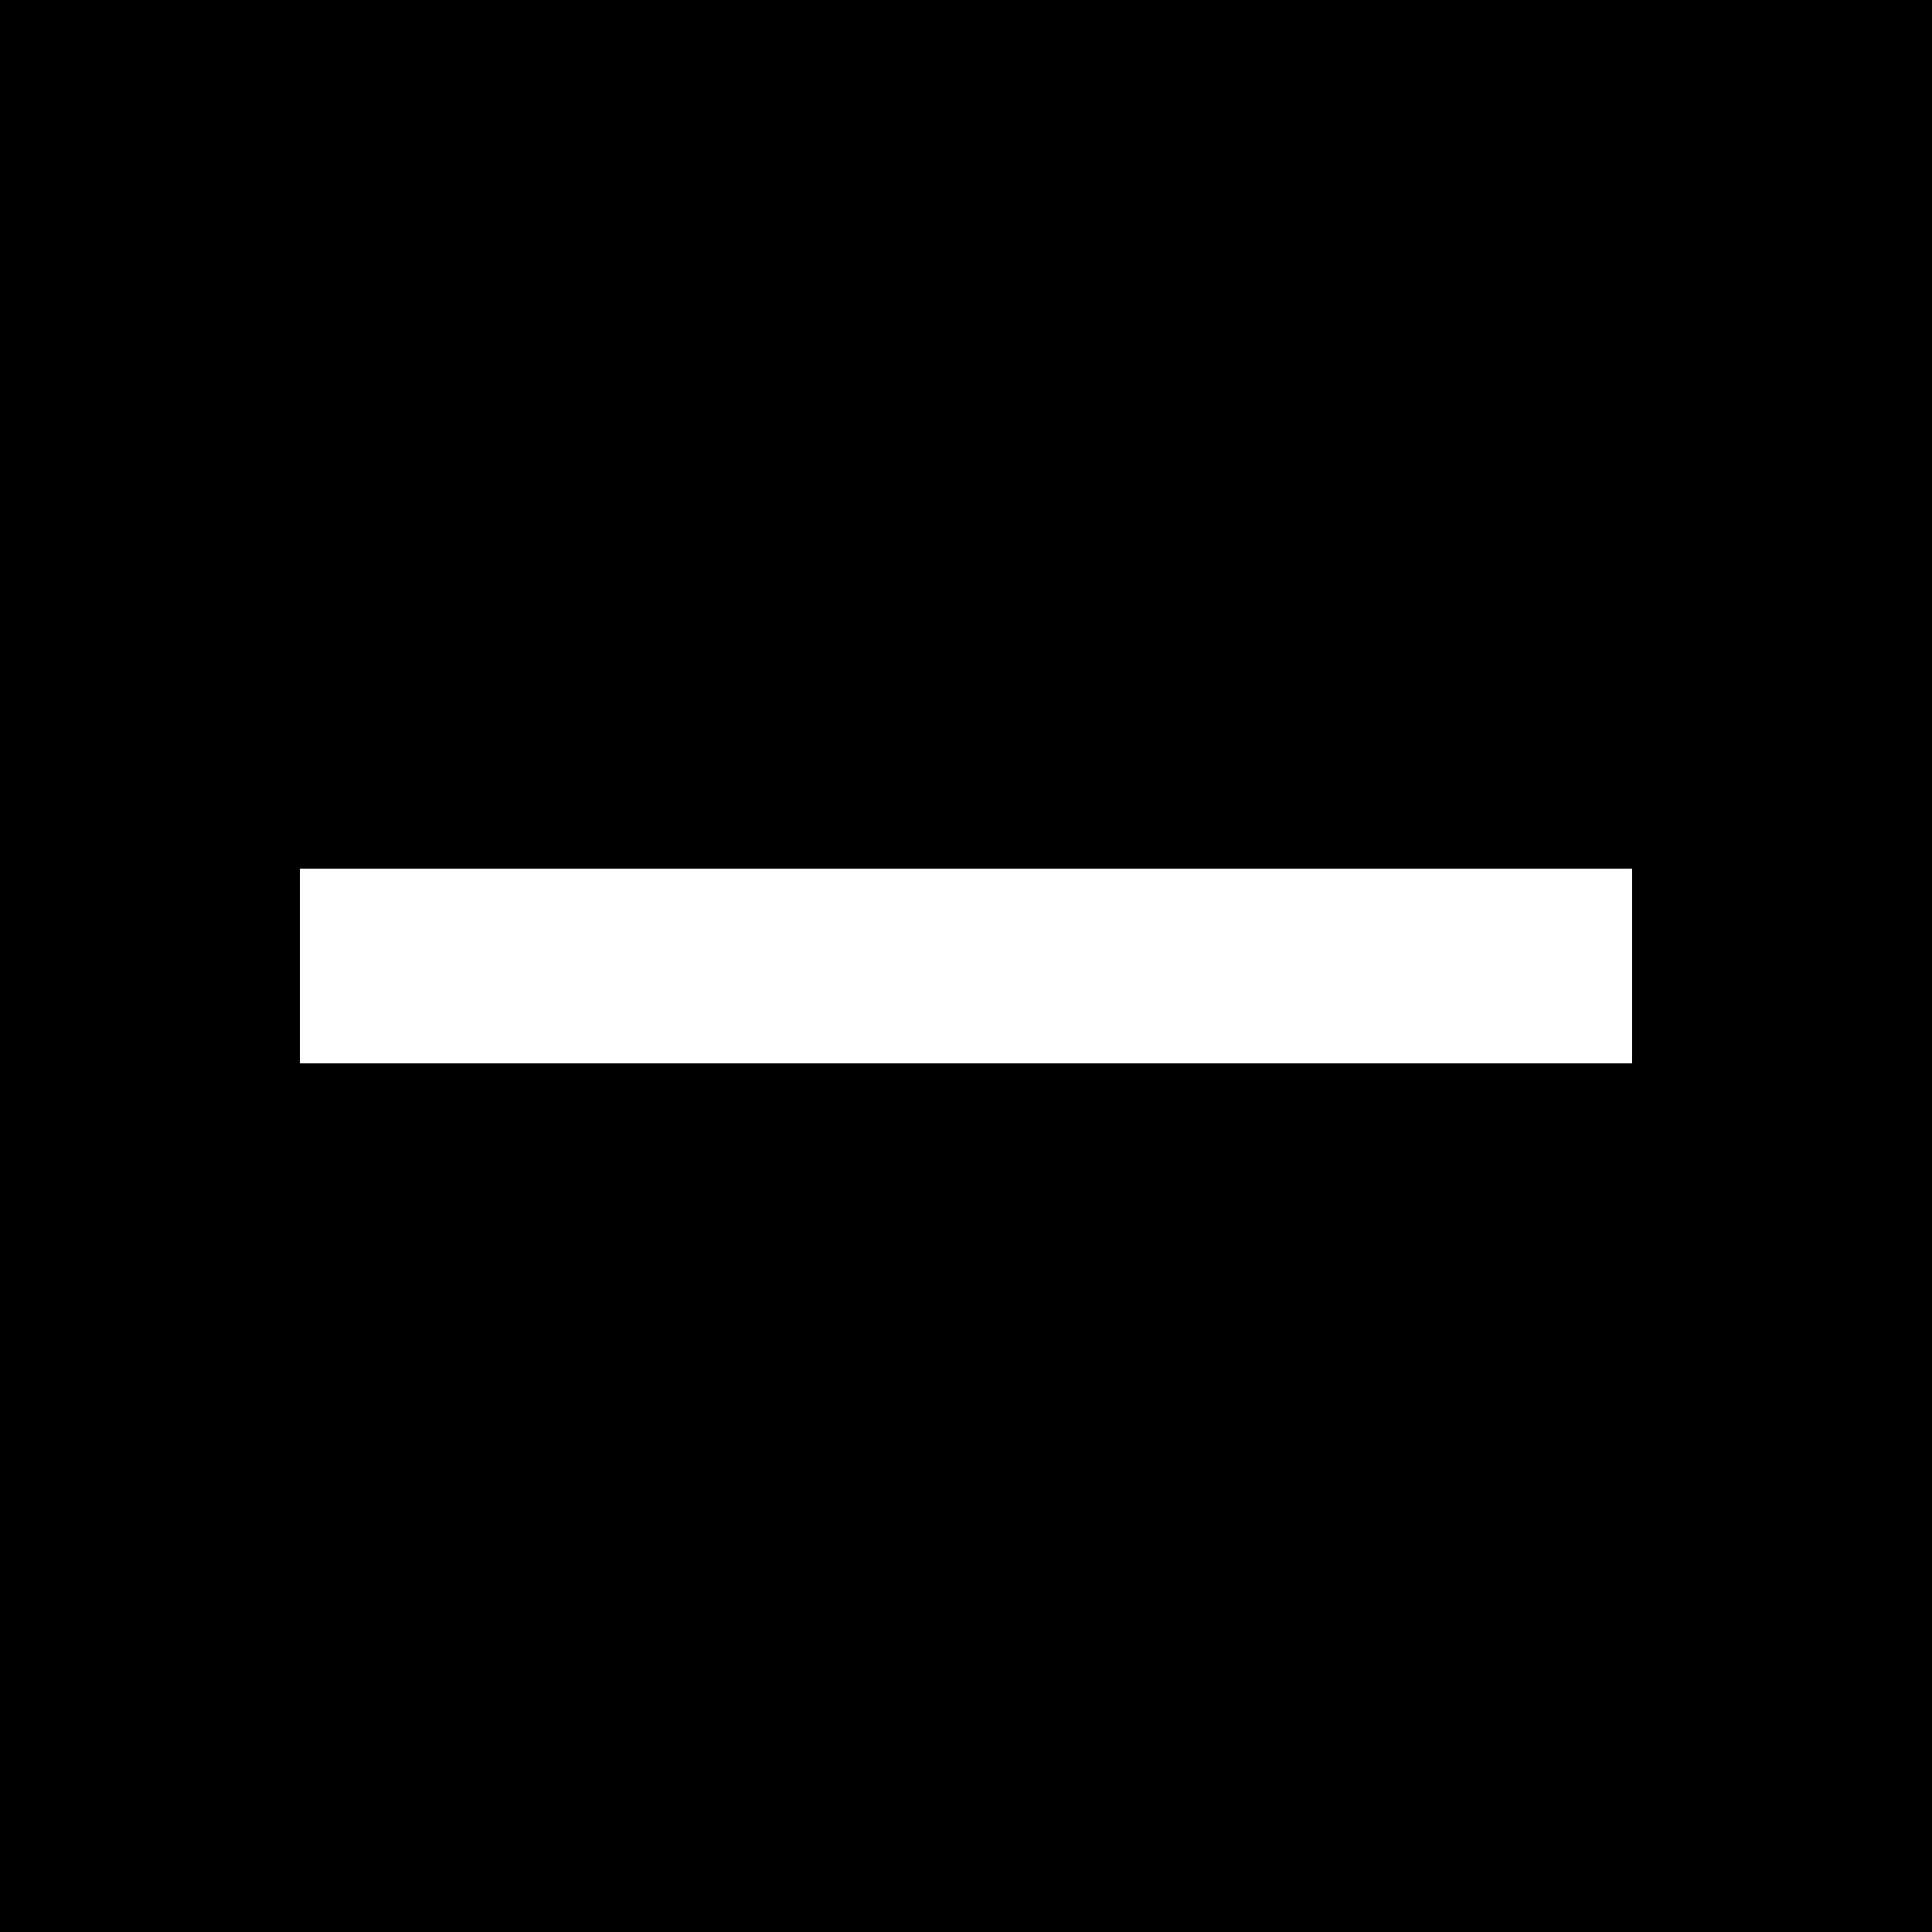 Enceladus logo